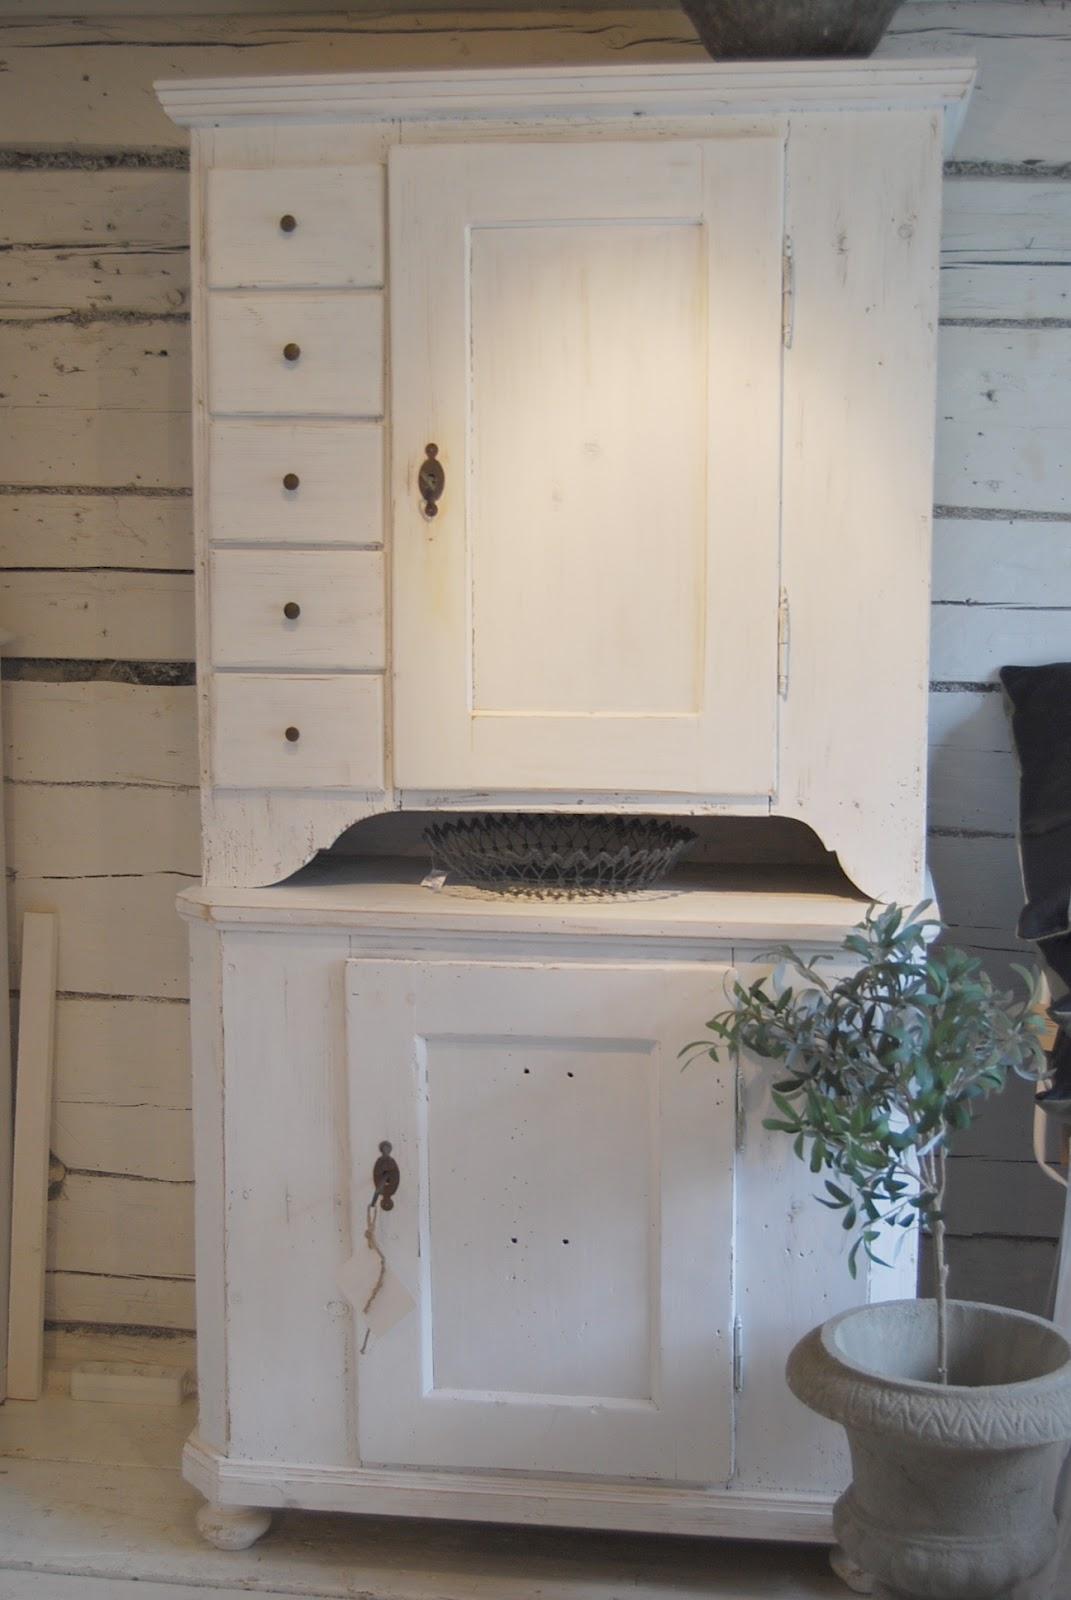 Metod Koksskap : gammalt koksskop  hobby,pyssel,hantverk,inredningsdetaljer,detaljer